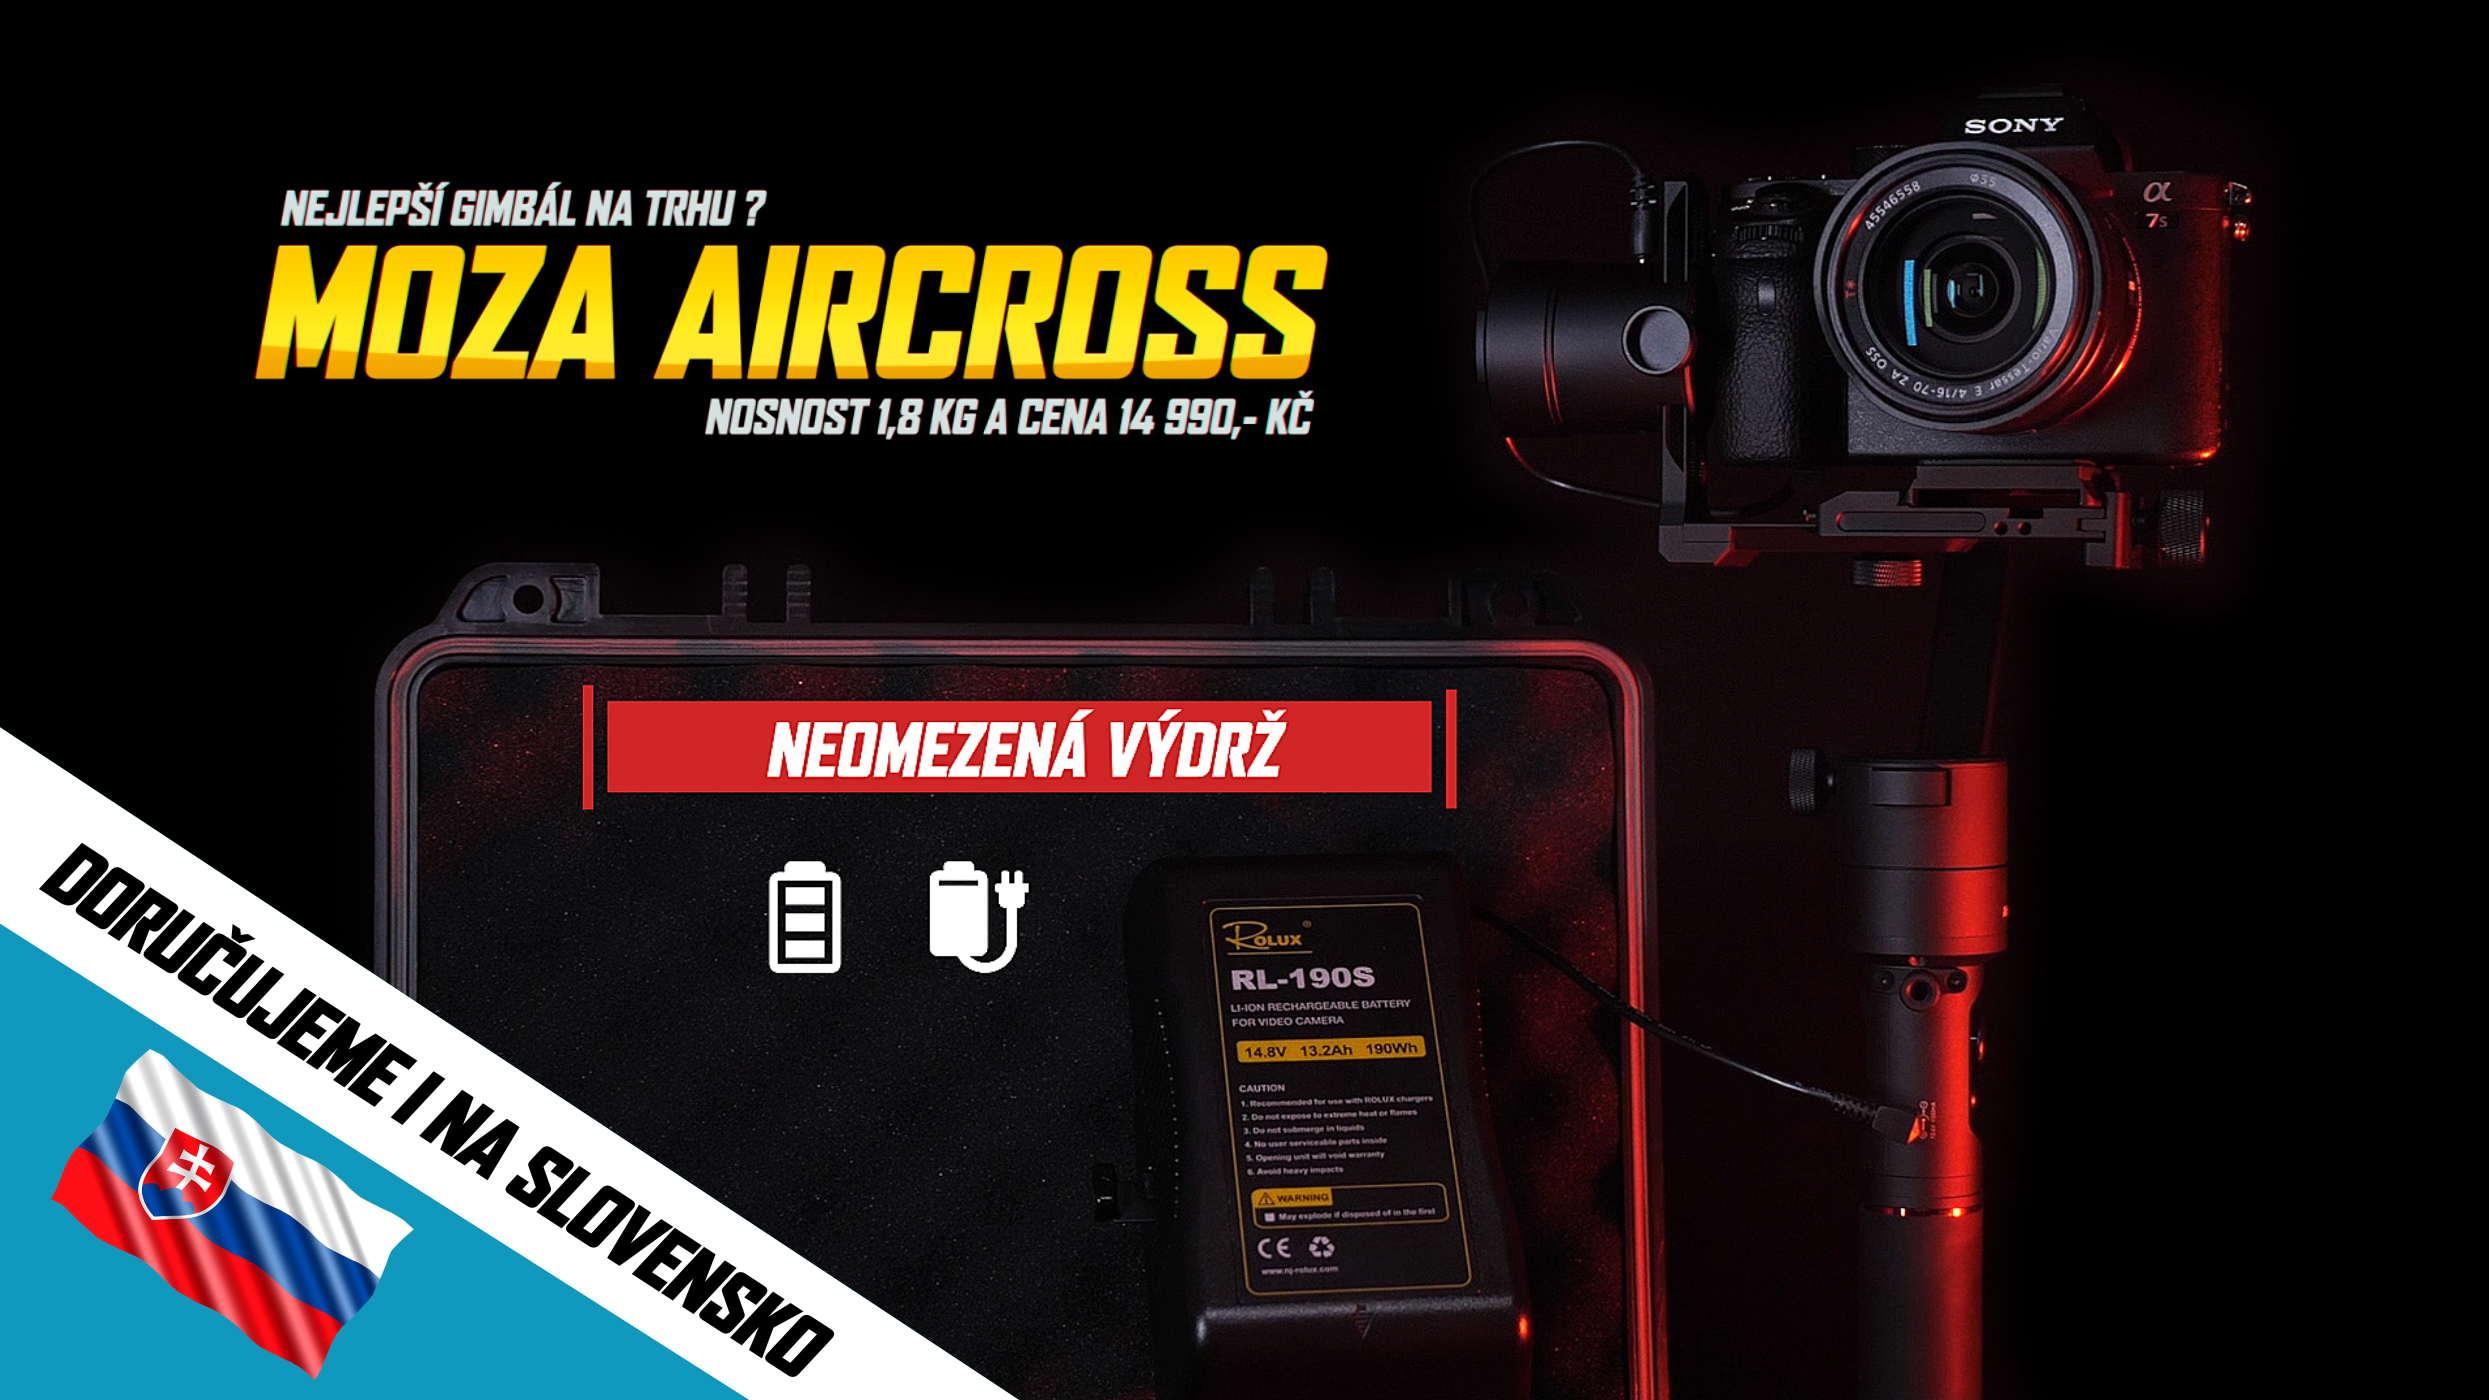 Moza Aircross